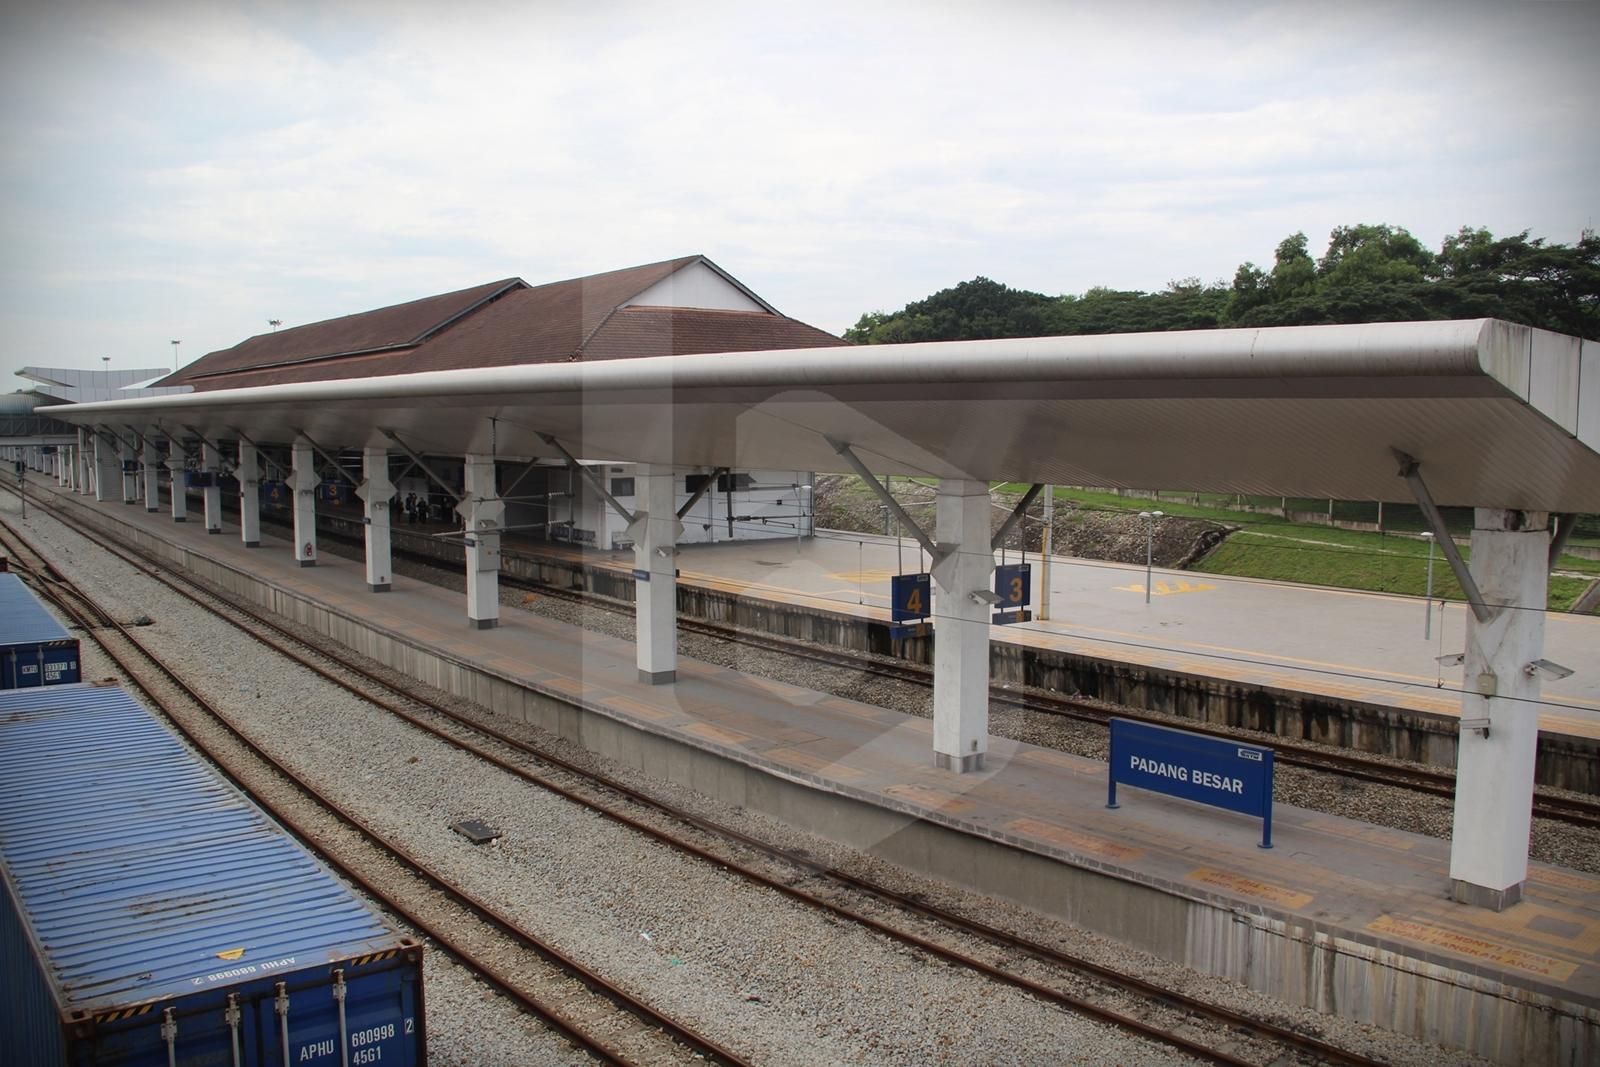 Padang Besar to Kuala Lumpur by train